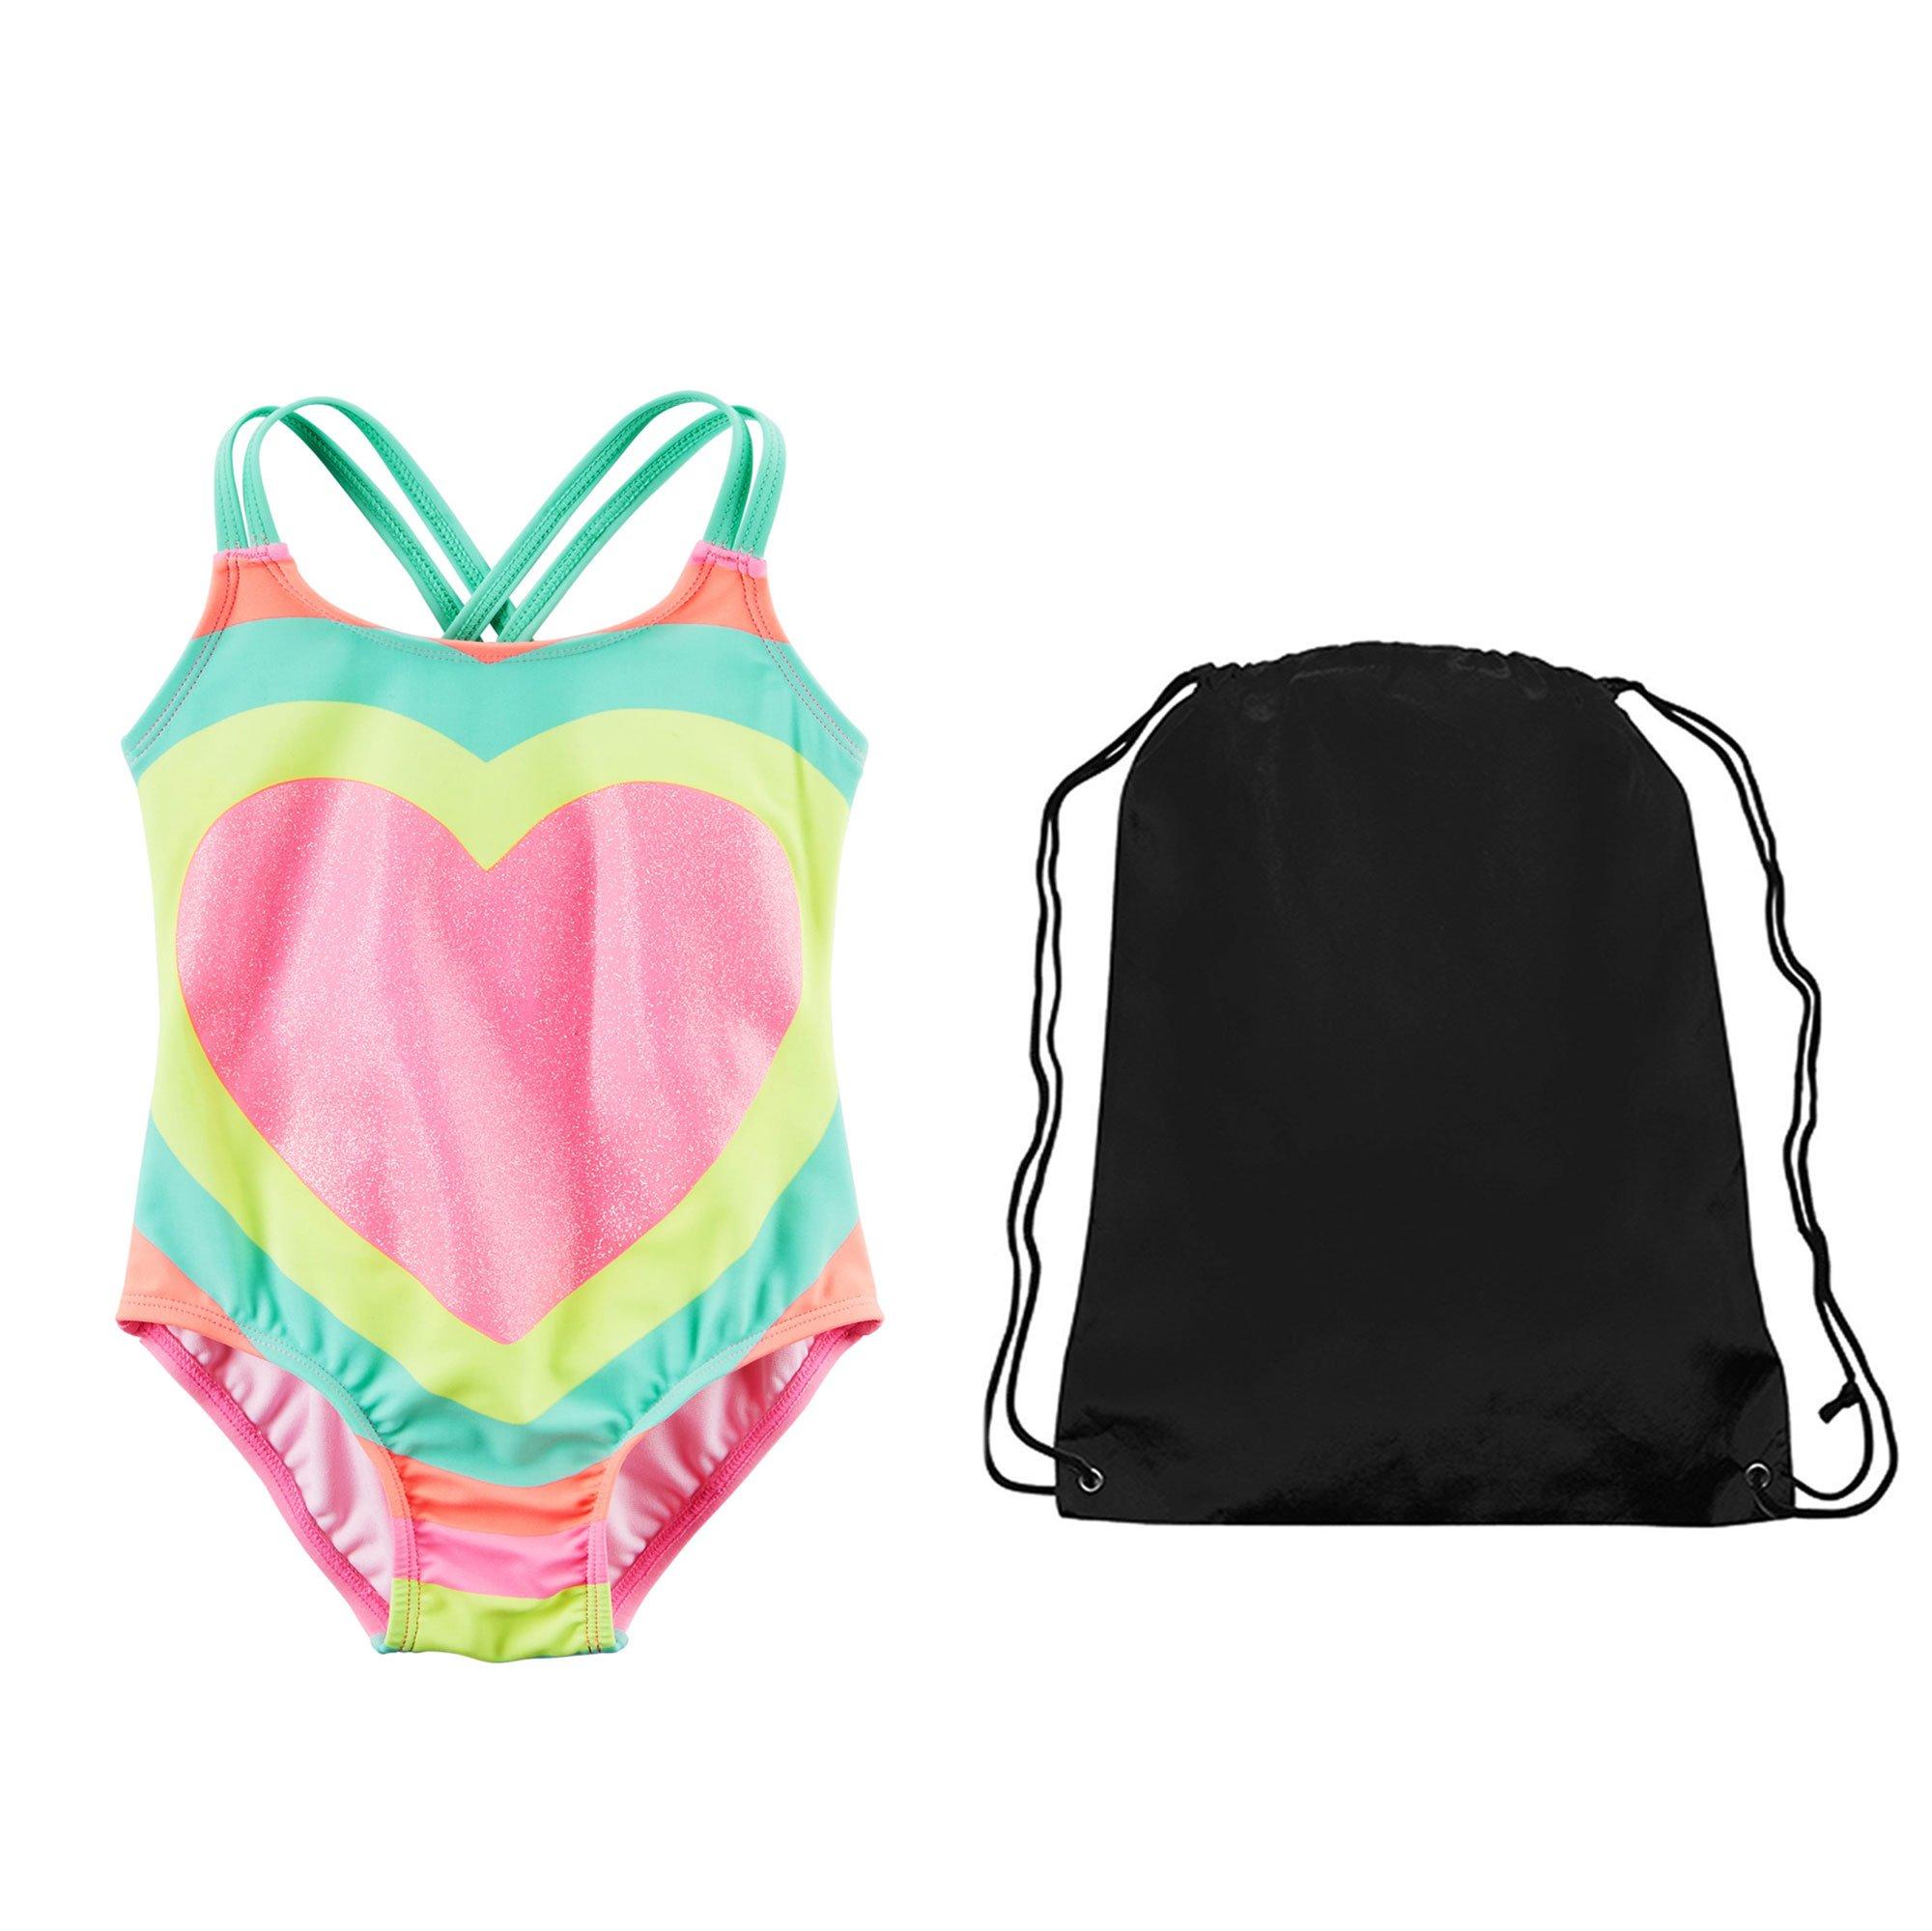 Carter's Girls Glitter Rainbow Heart One Piece Swimsuit and Swim Bag 5